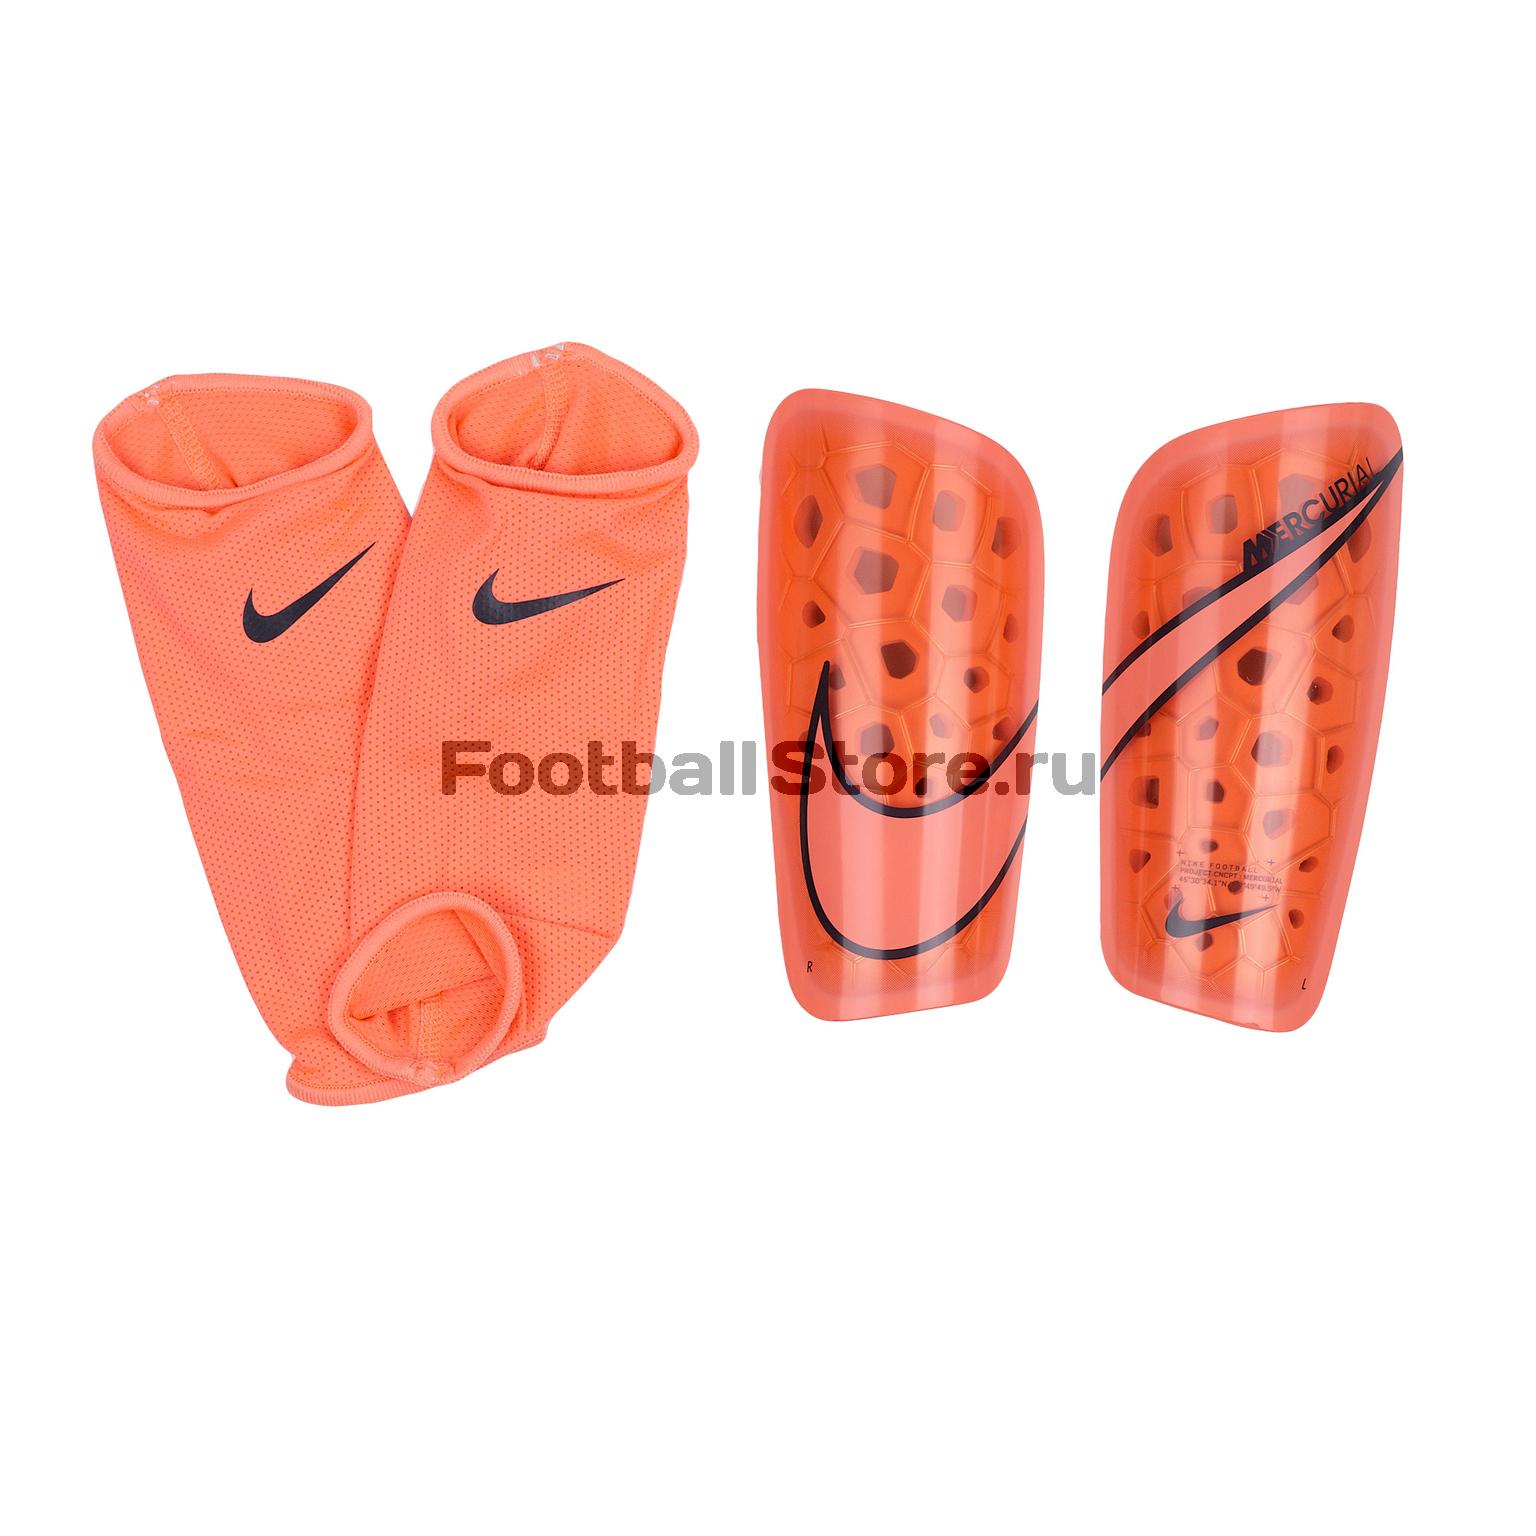 Щитки Nike Mercurial Lite GRD SP2120-892 щитки nike mercurial lite grd sp2120 704